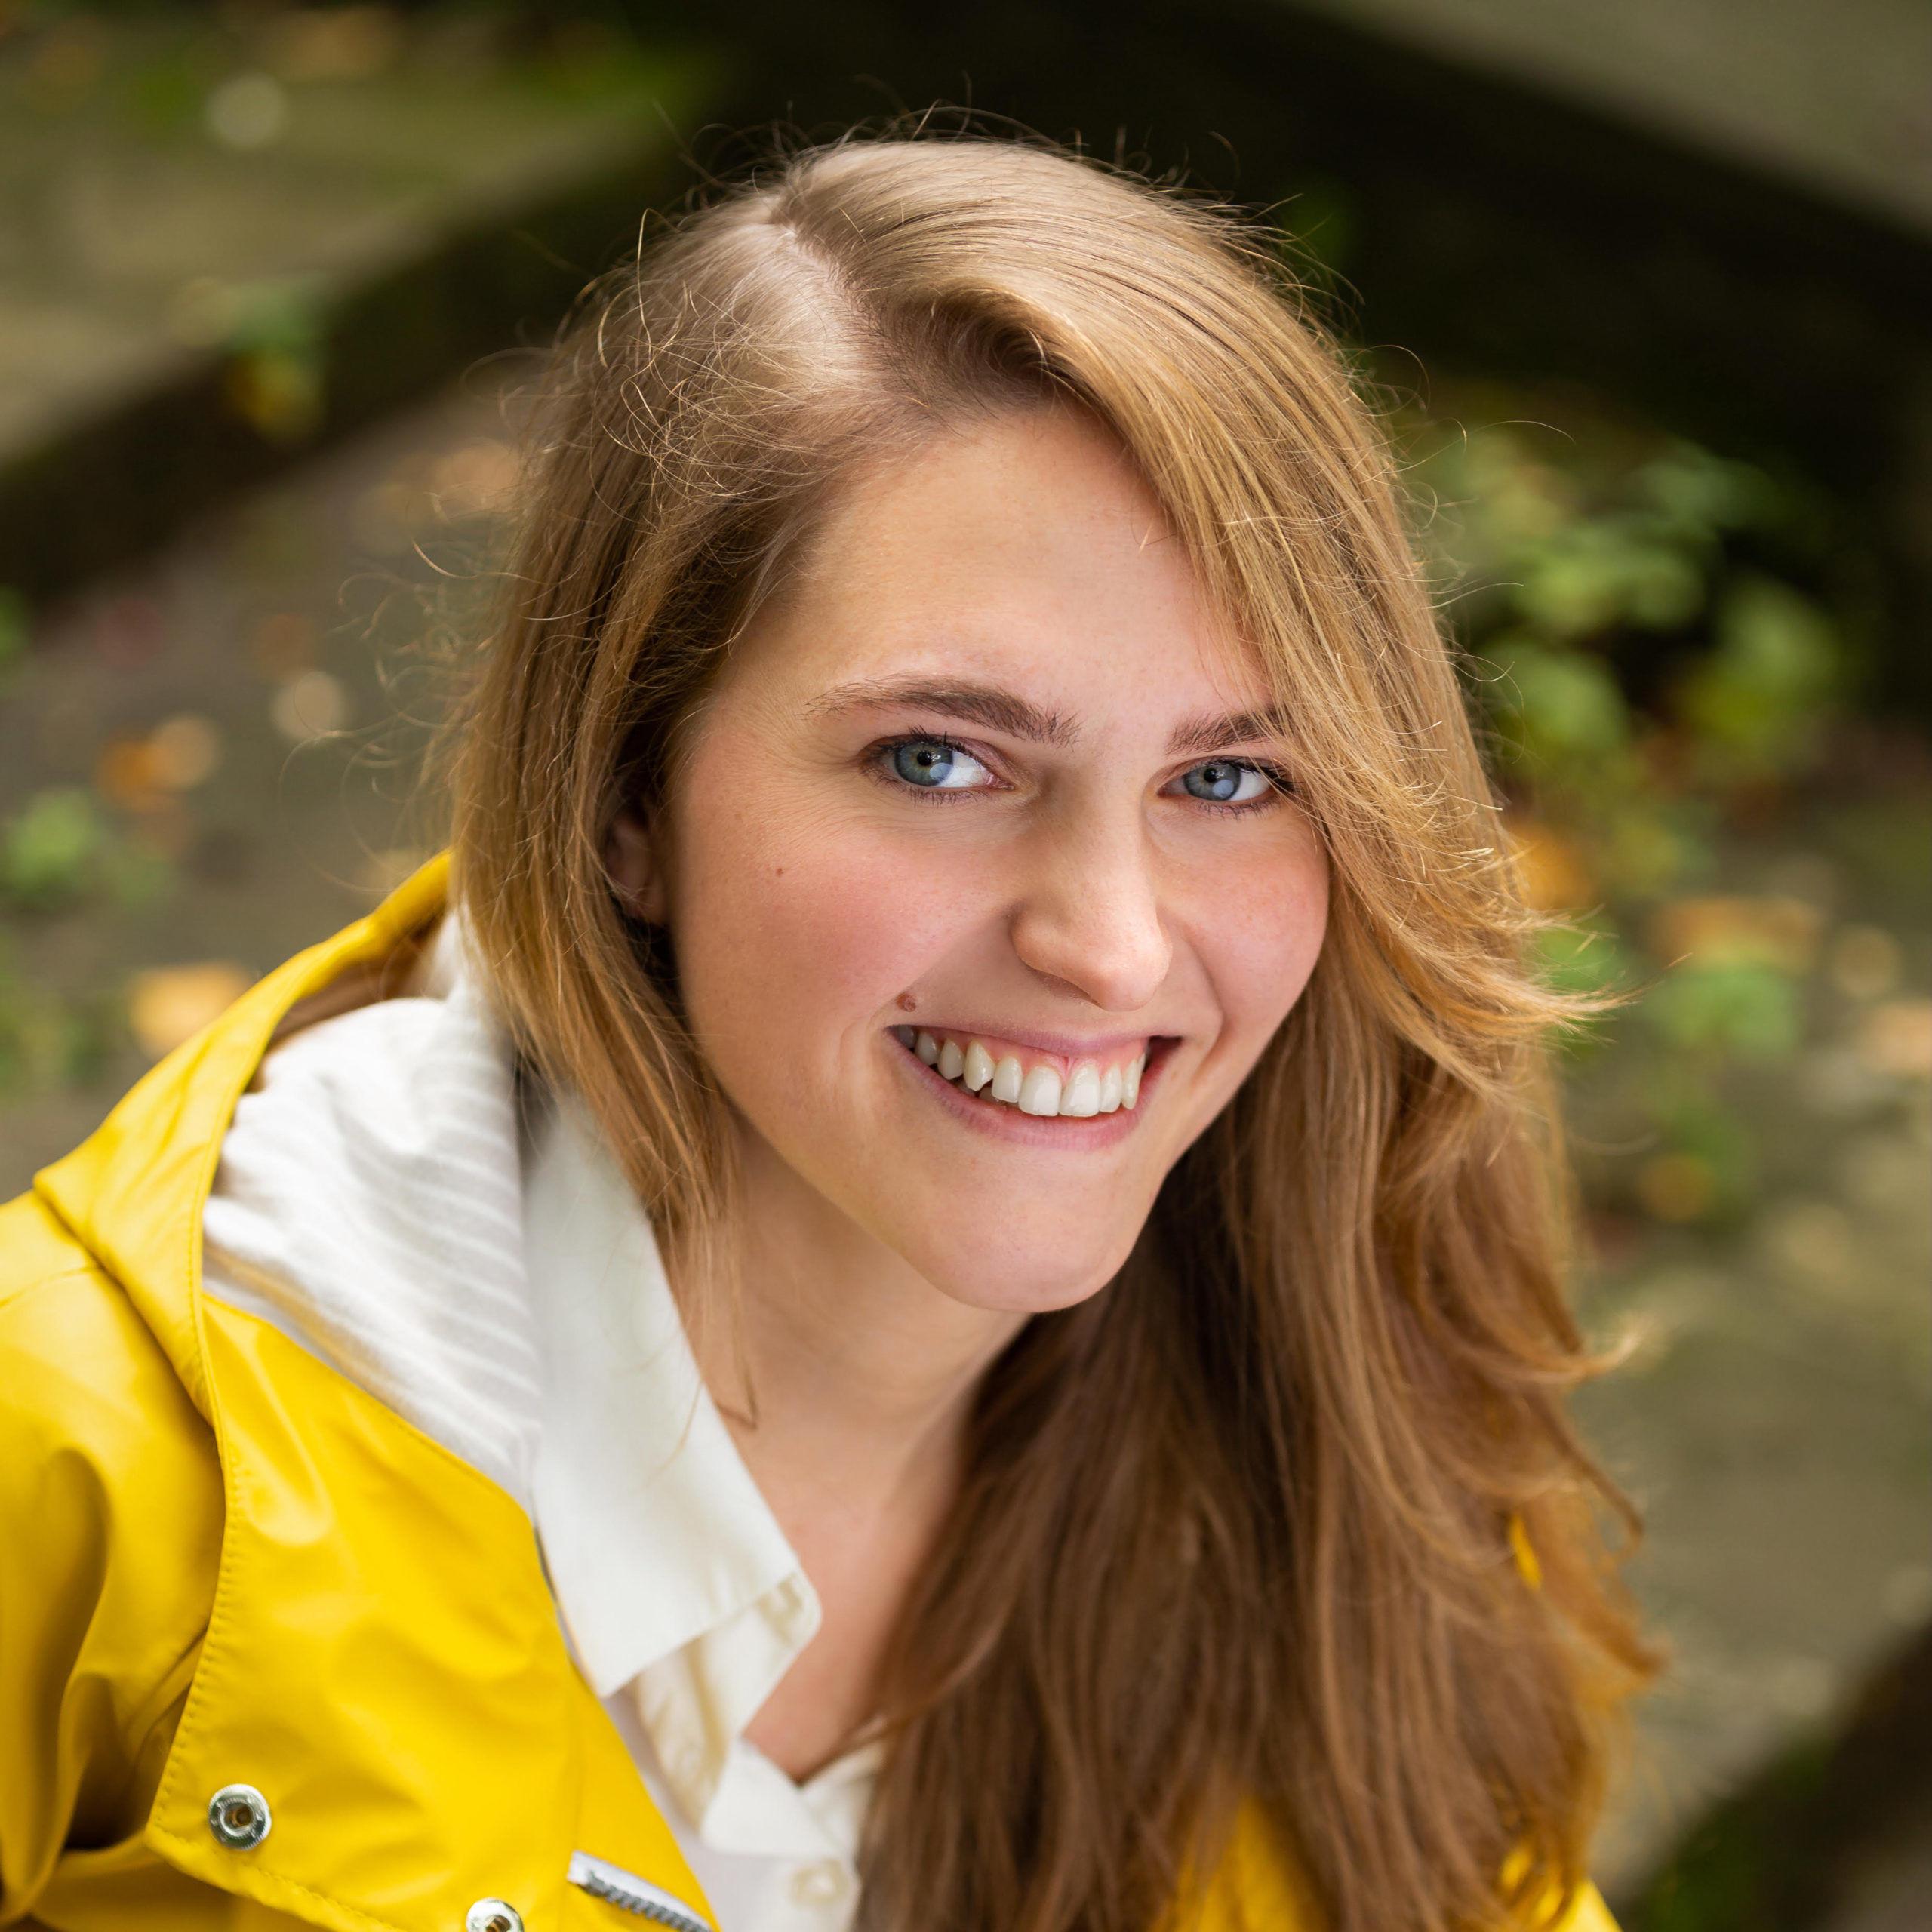 Laura Elßel Synchronsprecherin Audio Sängerin BA Musikproduktion Freelancer